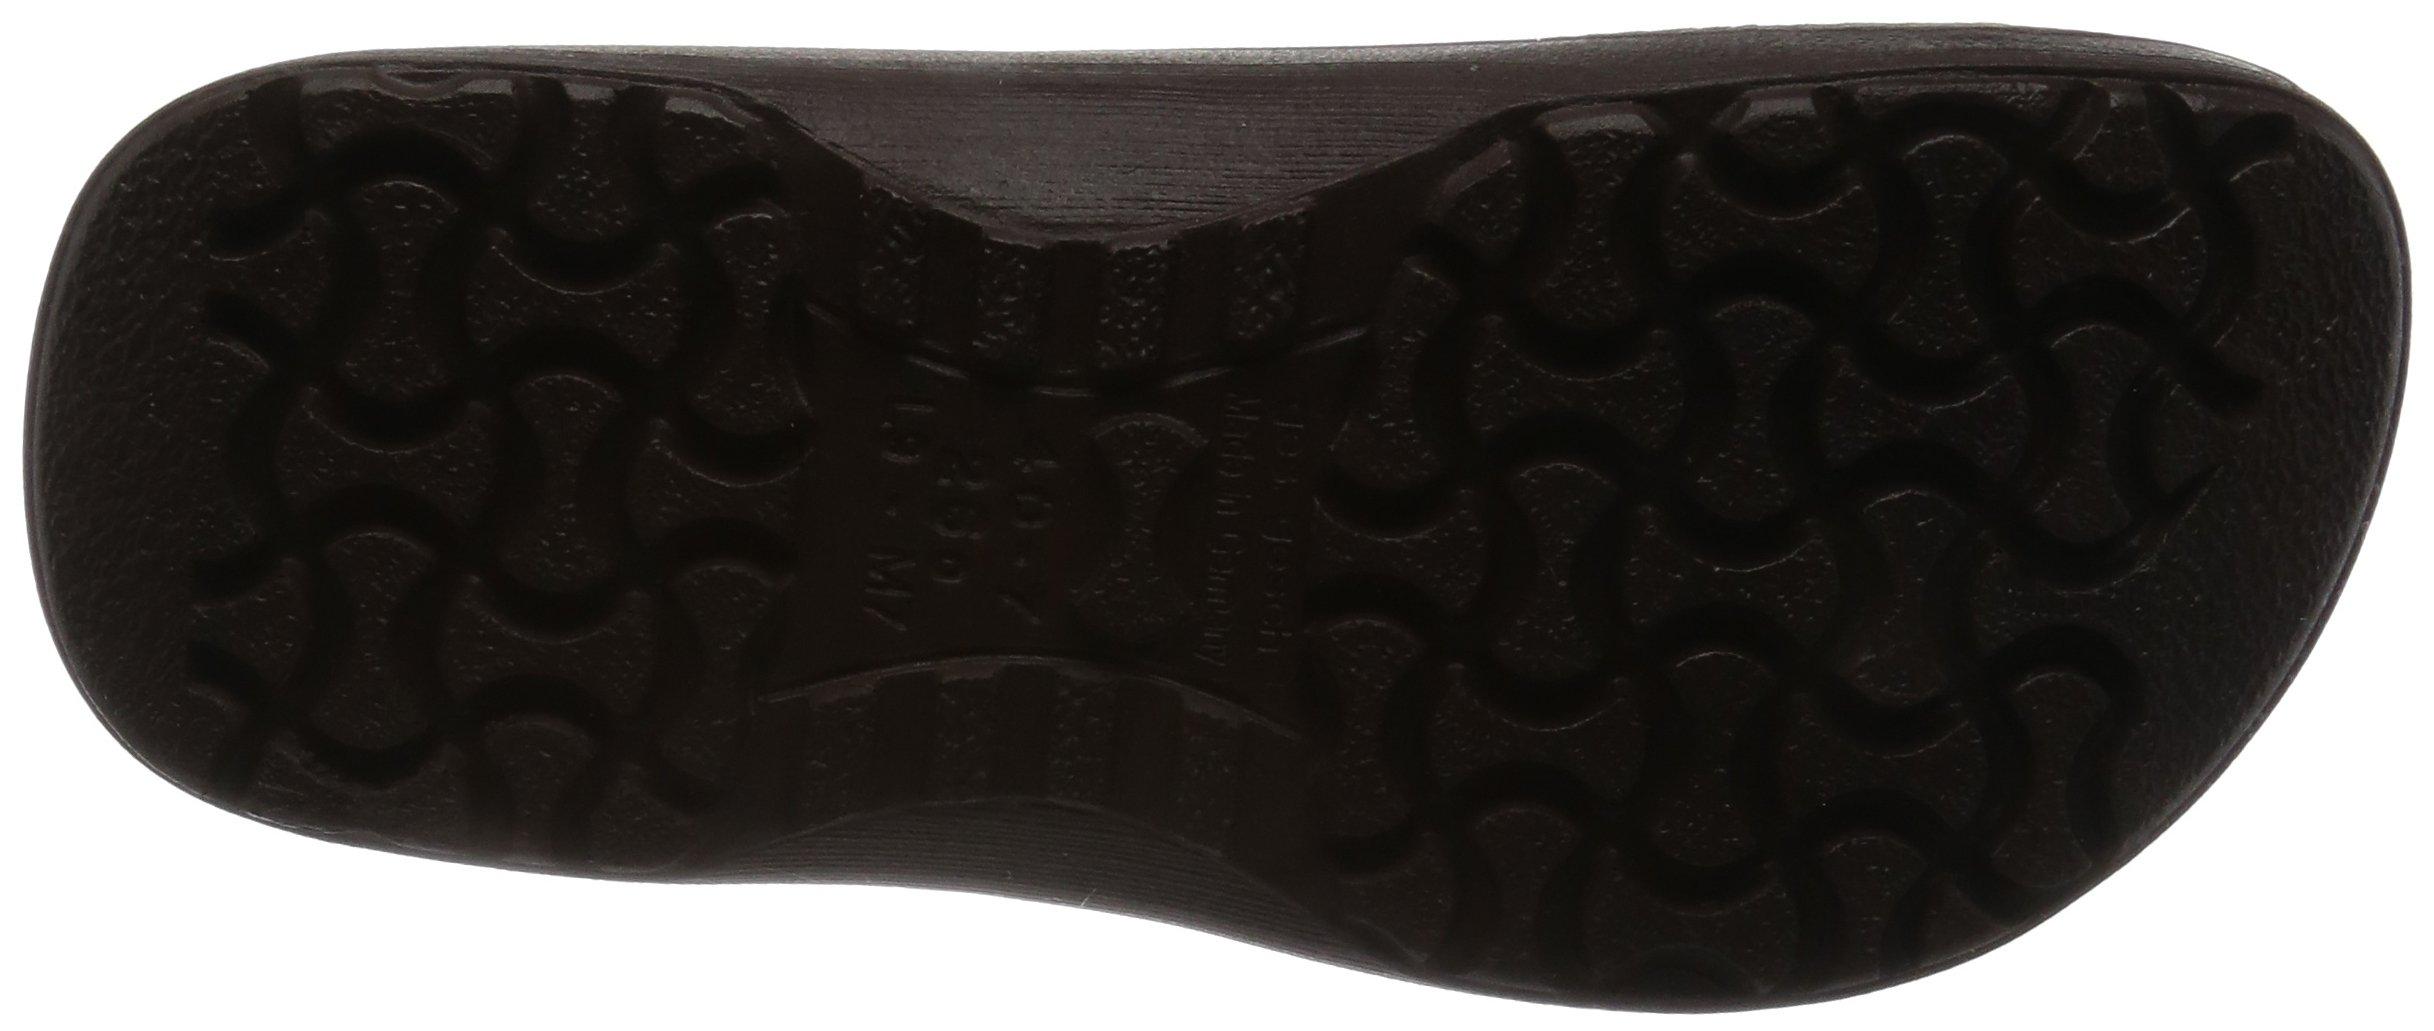 Birkenstock Men´s Profi-Birki Brown Alpro-Foam Sandals 40 EU (M7/L9 US) R 074061 by Birkenstock (Image #3)